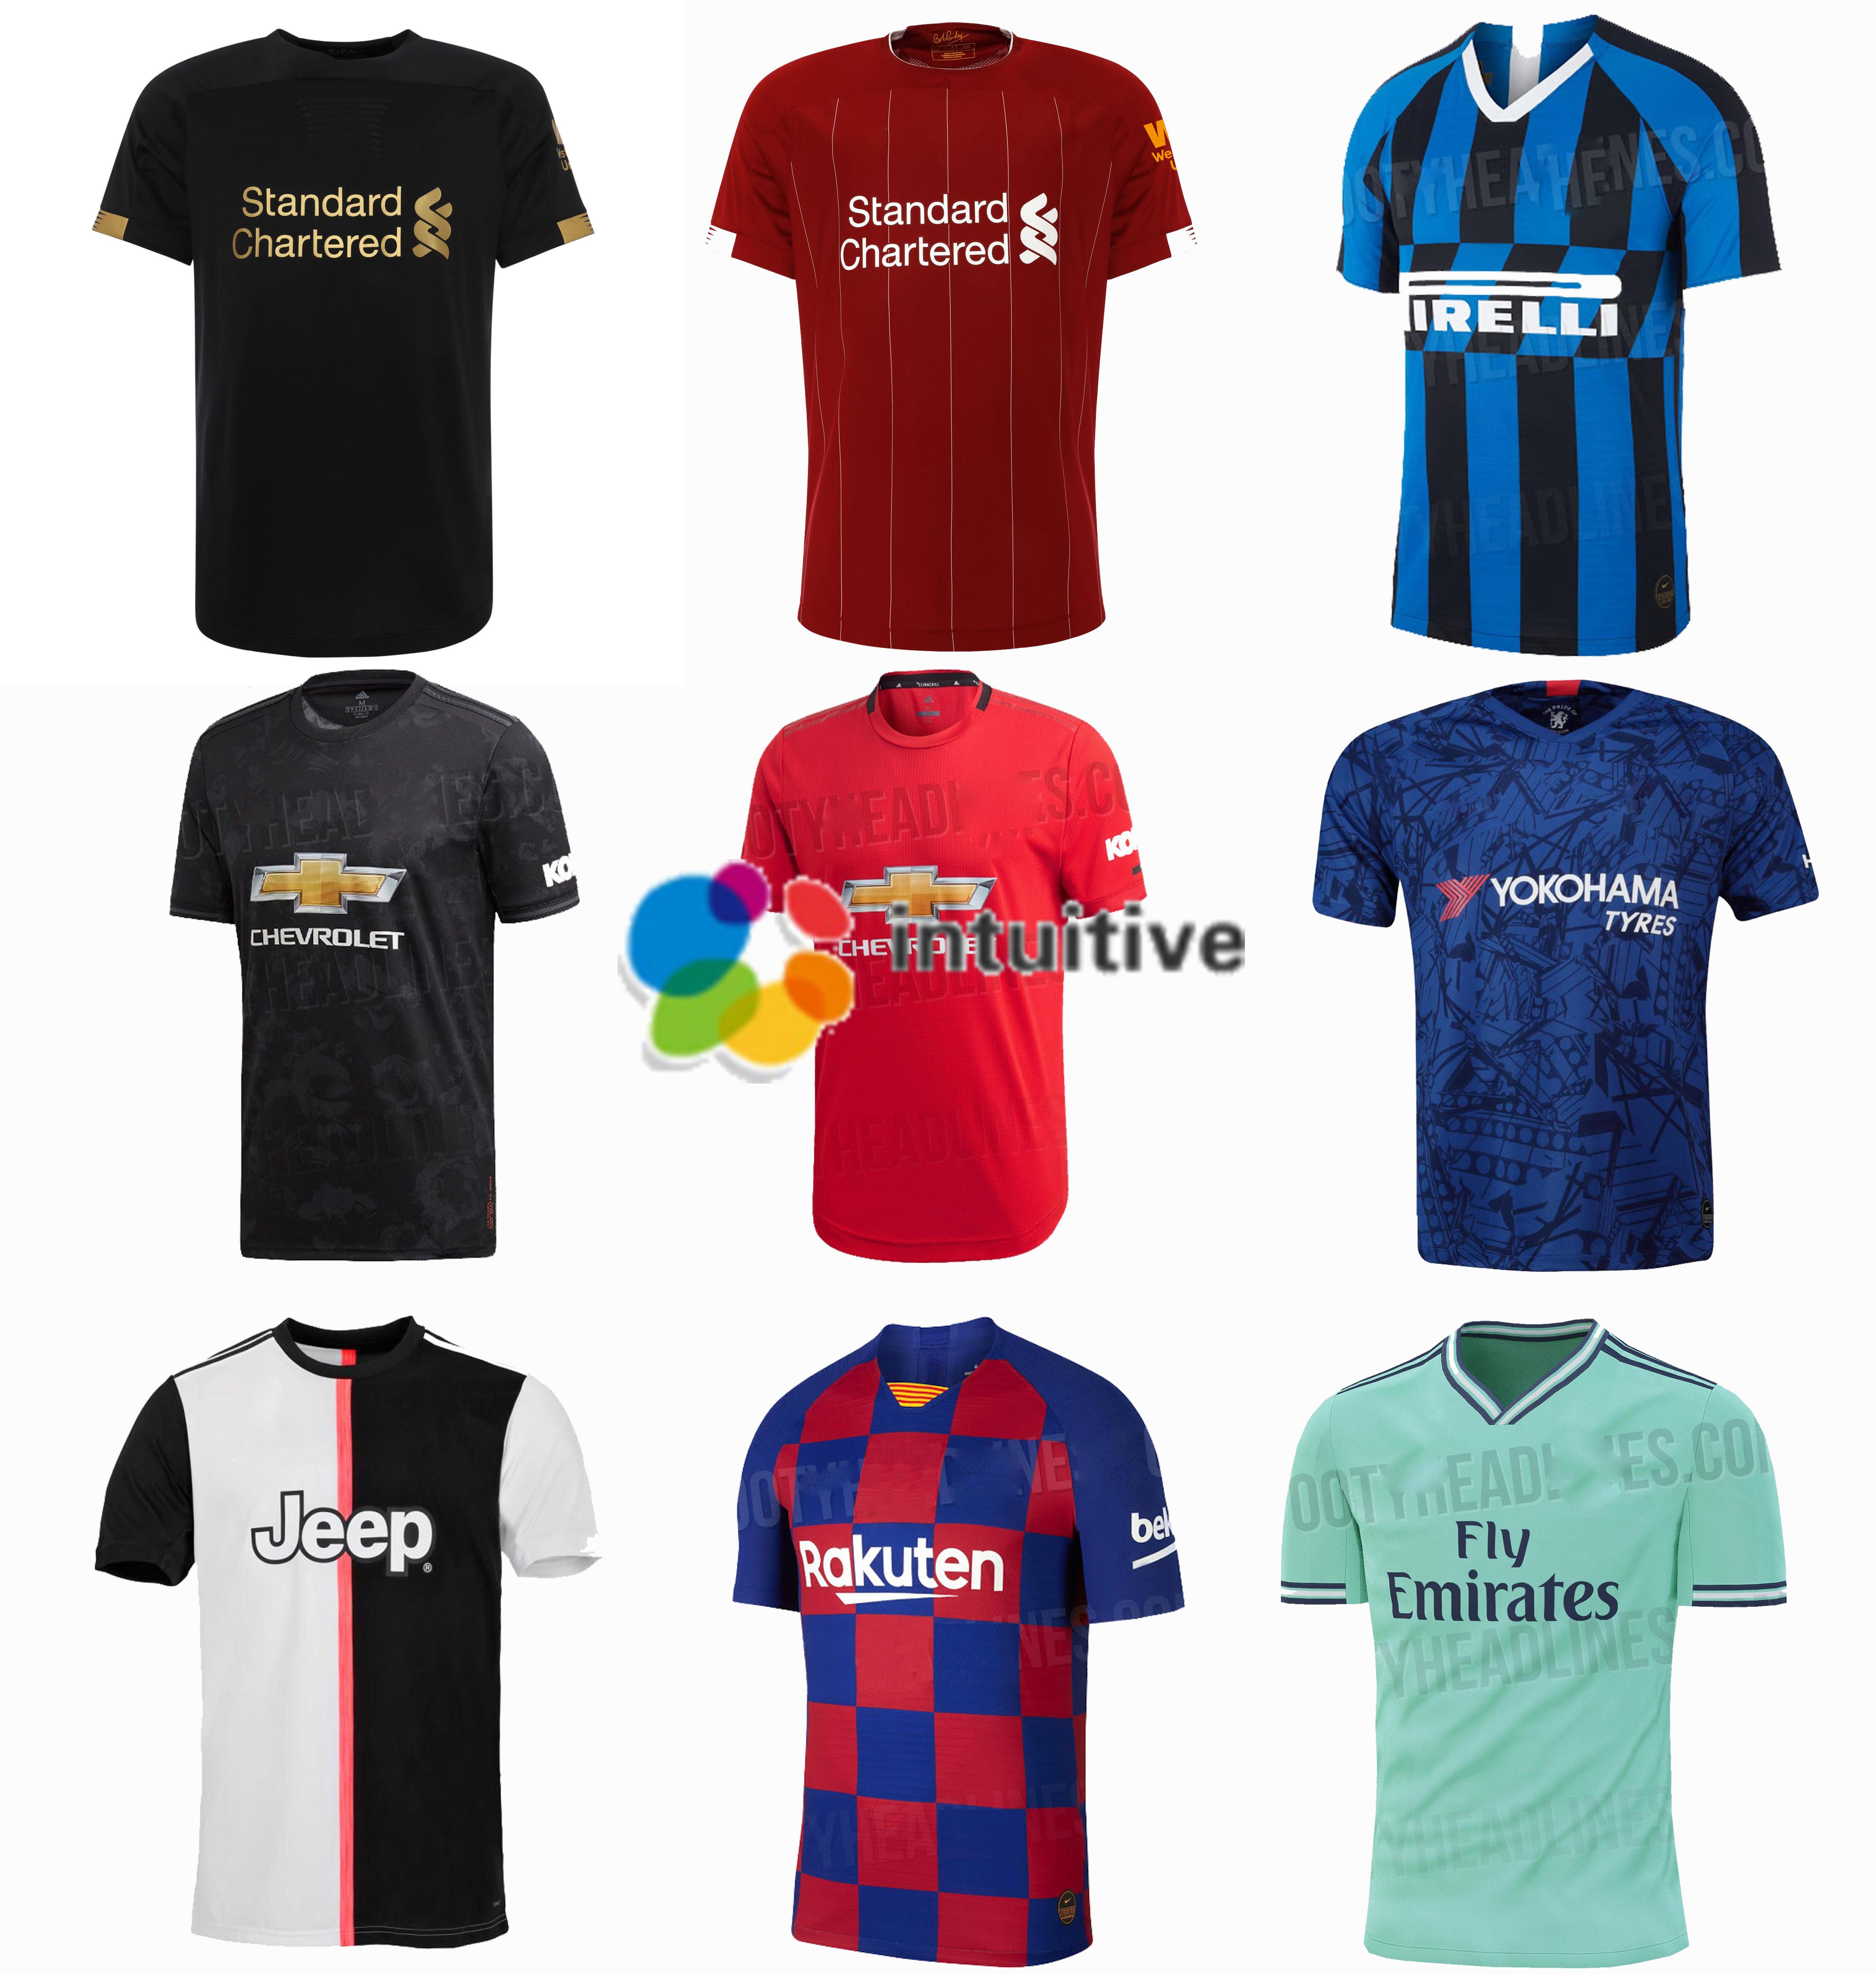 Wholesaler 2019/20 real united juventus Chelseea inter soccer wear neymar camisas de futebol jersey kit фото